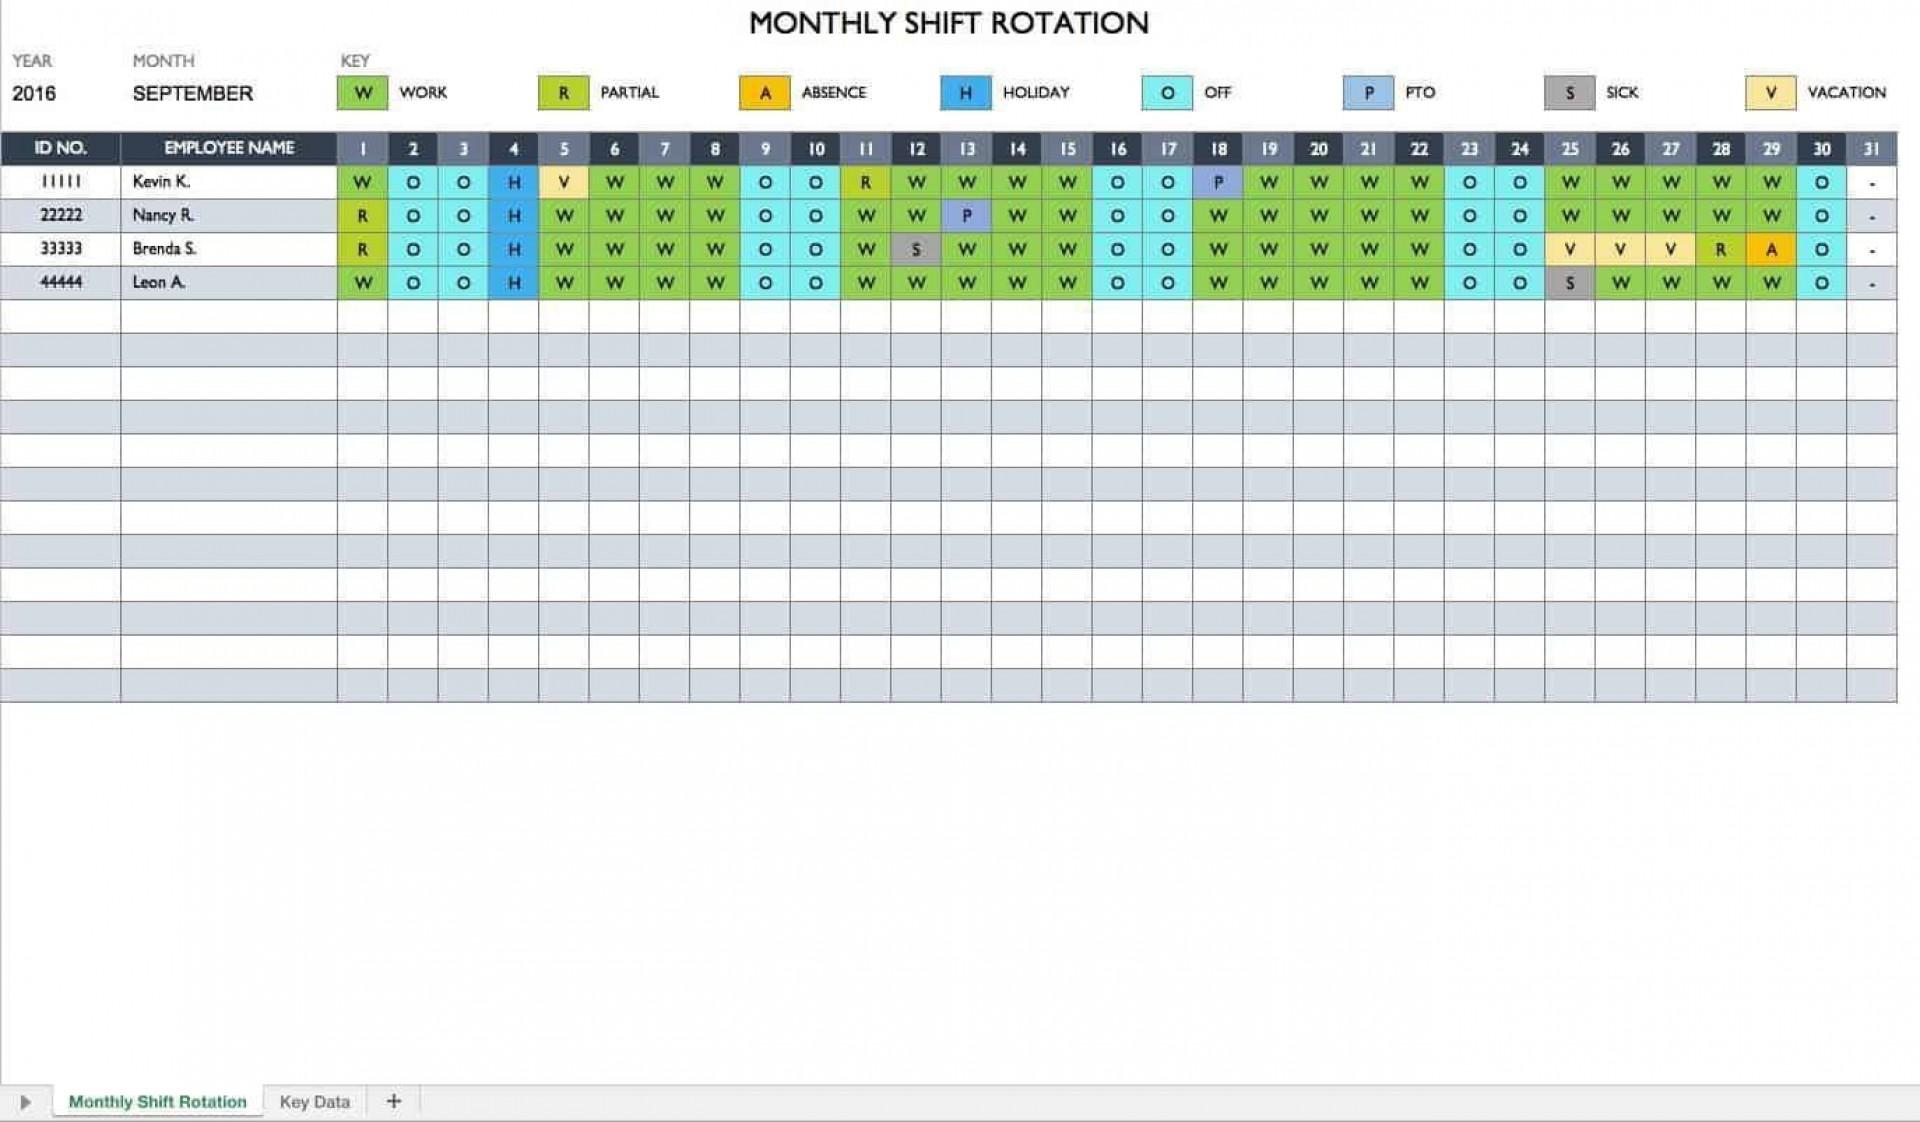 002 Frightening Employee Shift Scheduling Template High Def  Schedule Google Sheet Work Plan Word Weekly Excel Free1920